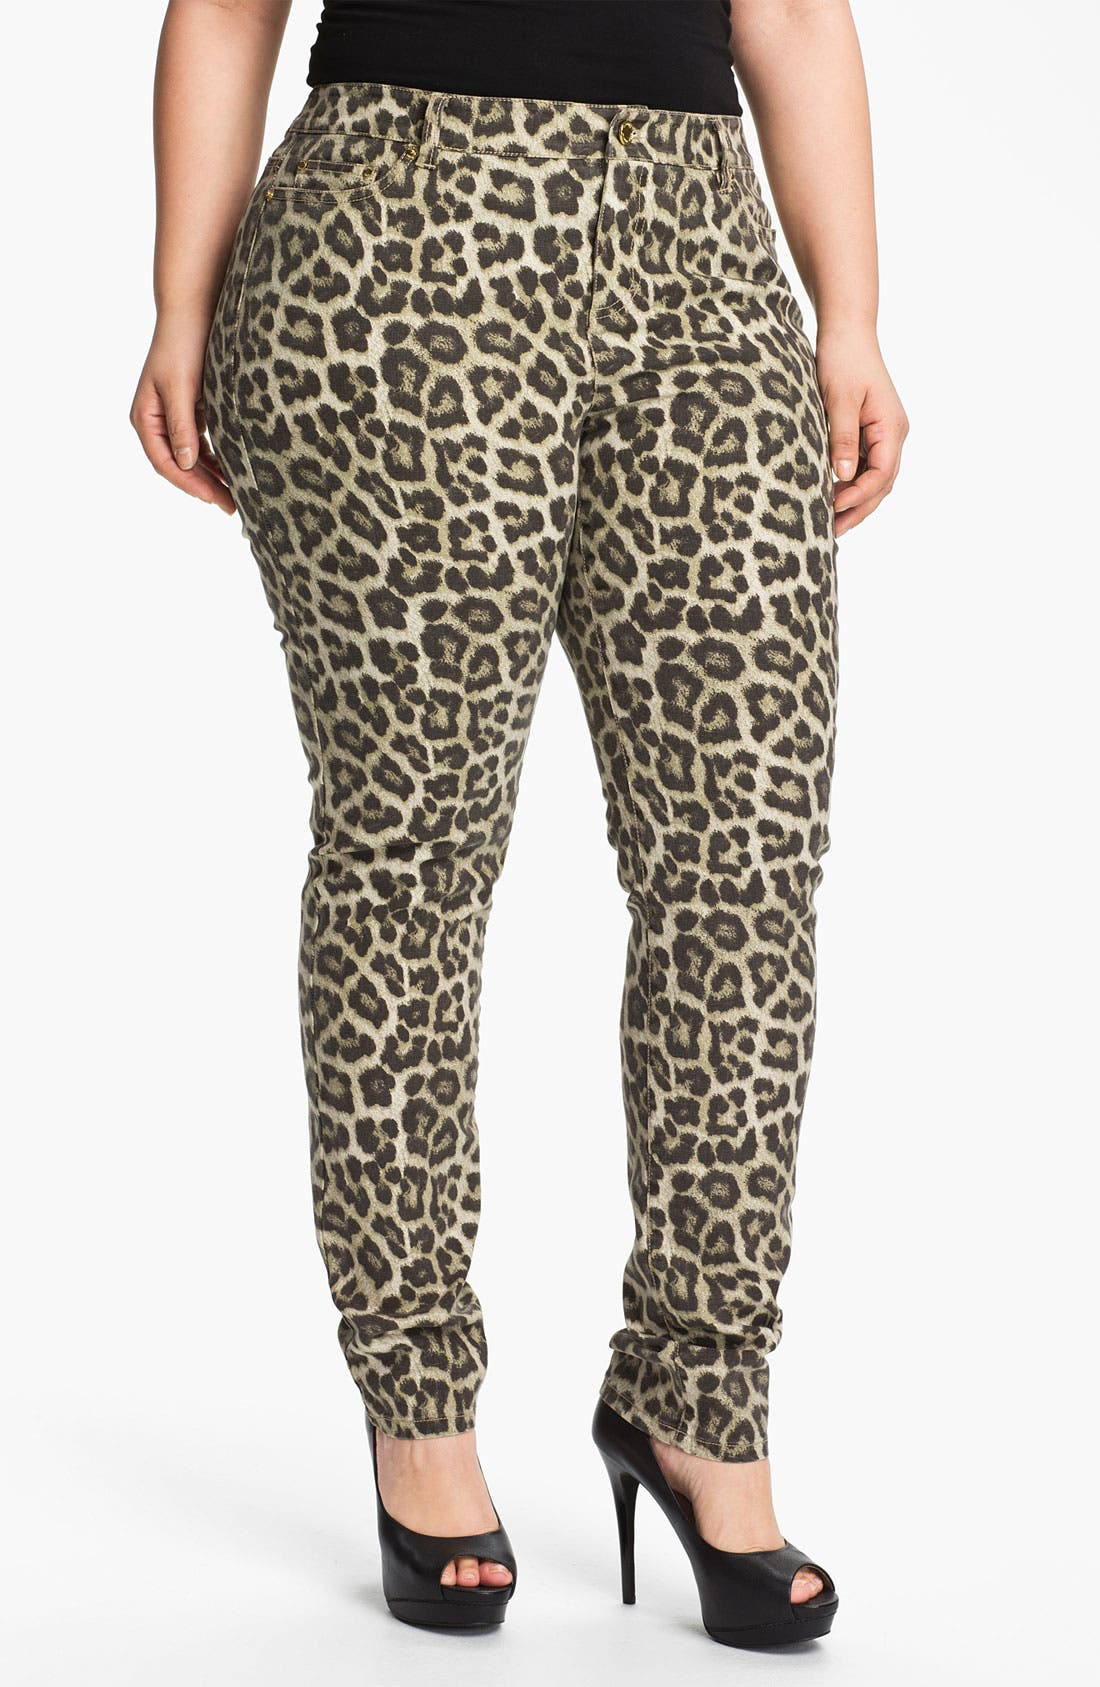 Alternate Image 1 Selected - MICHAEL Michael Kors 'Savannah' Leopard Print Skinny Jeans (Plus)